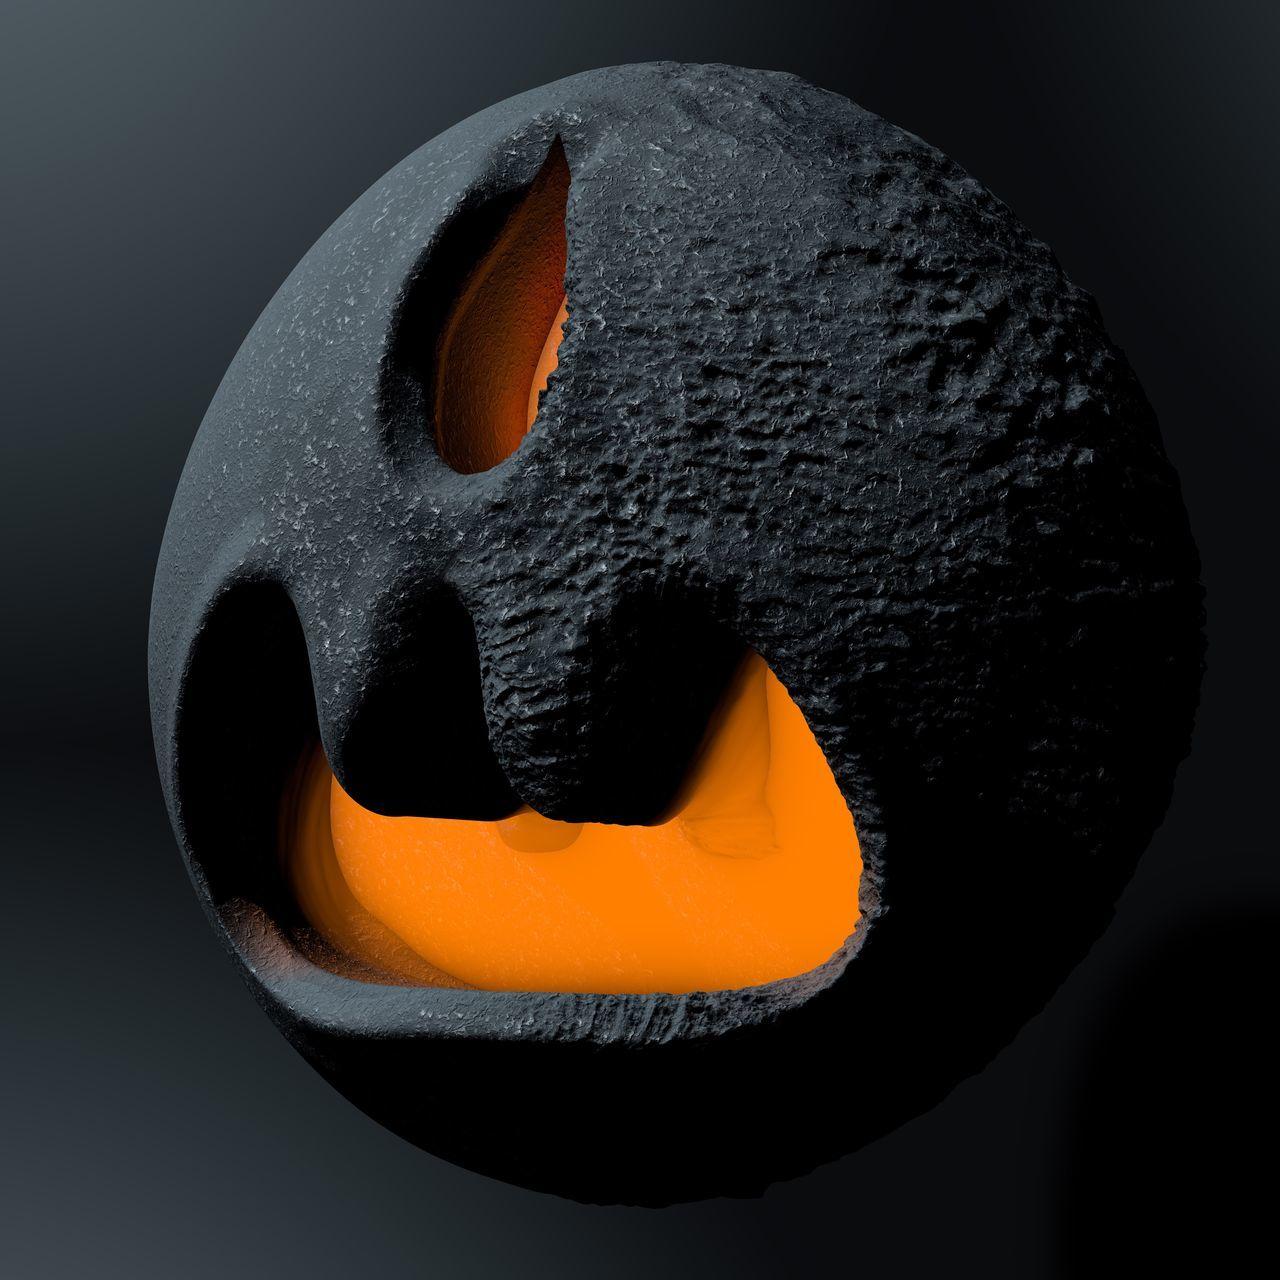 orange color, studio shot, black background, no people, close-up, black color, indoors, anthropomorphic face, night, halloween, jack o lantern